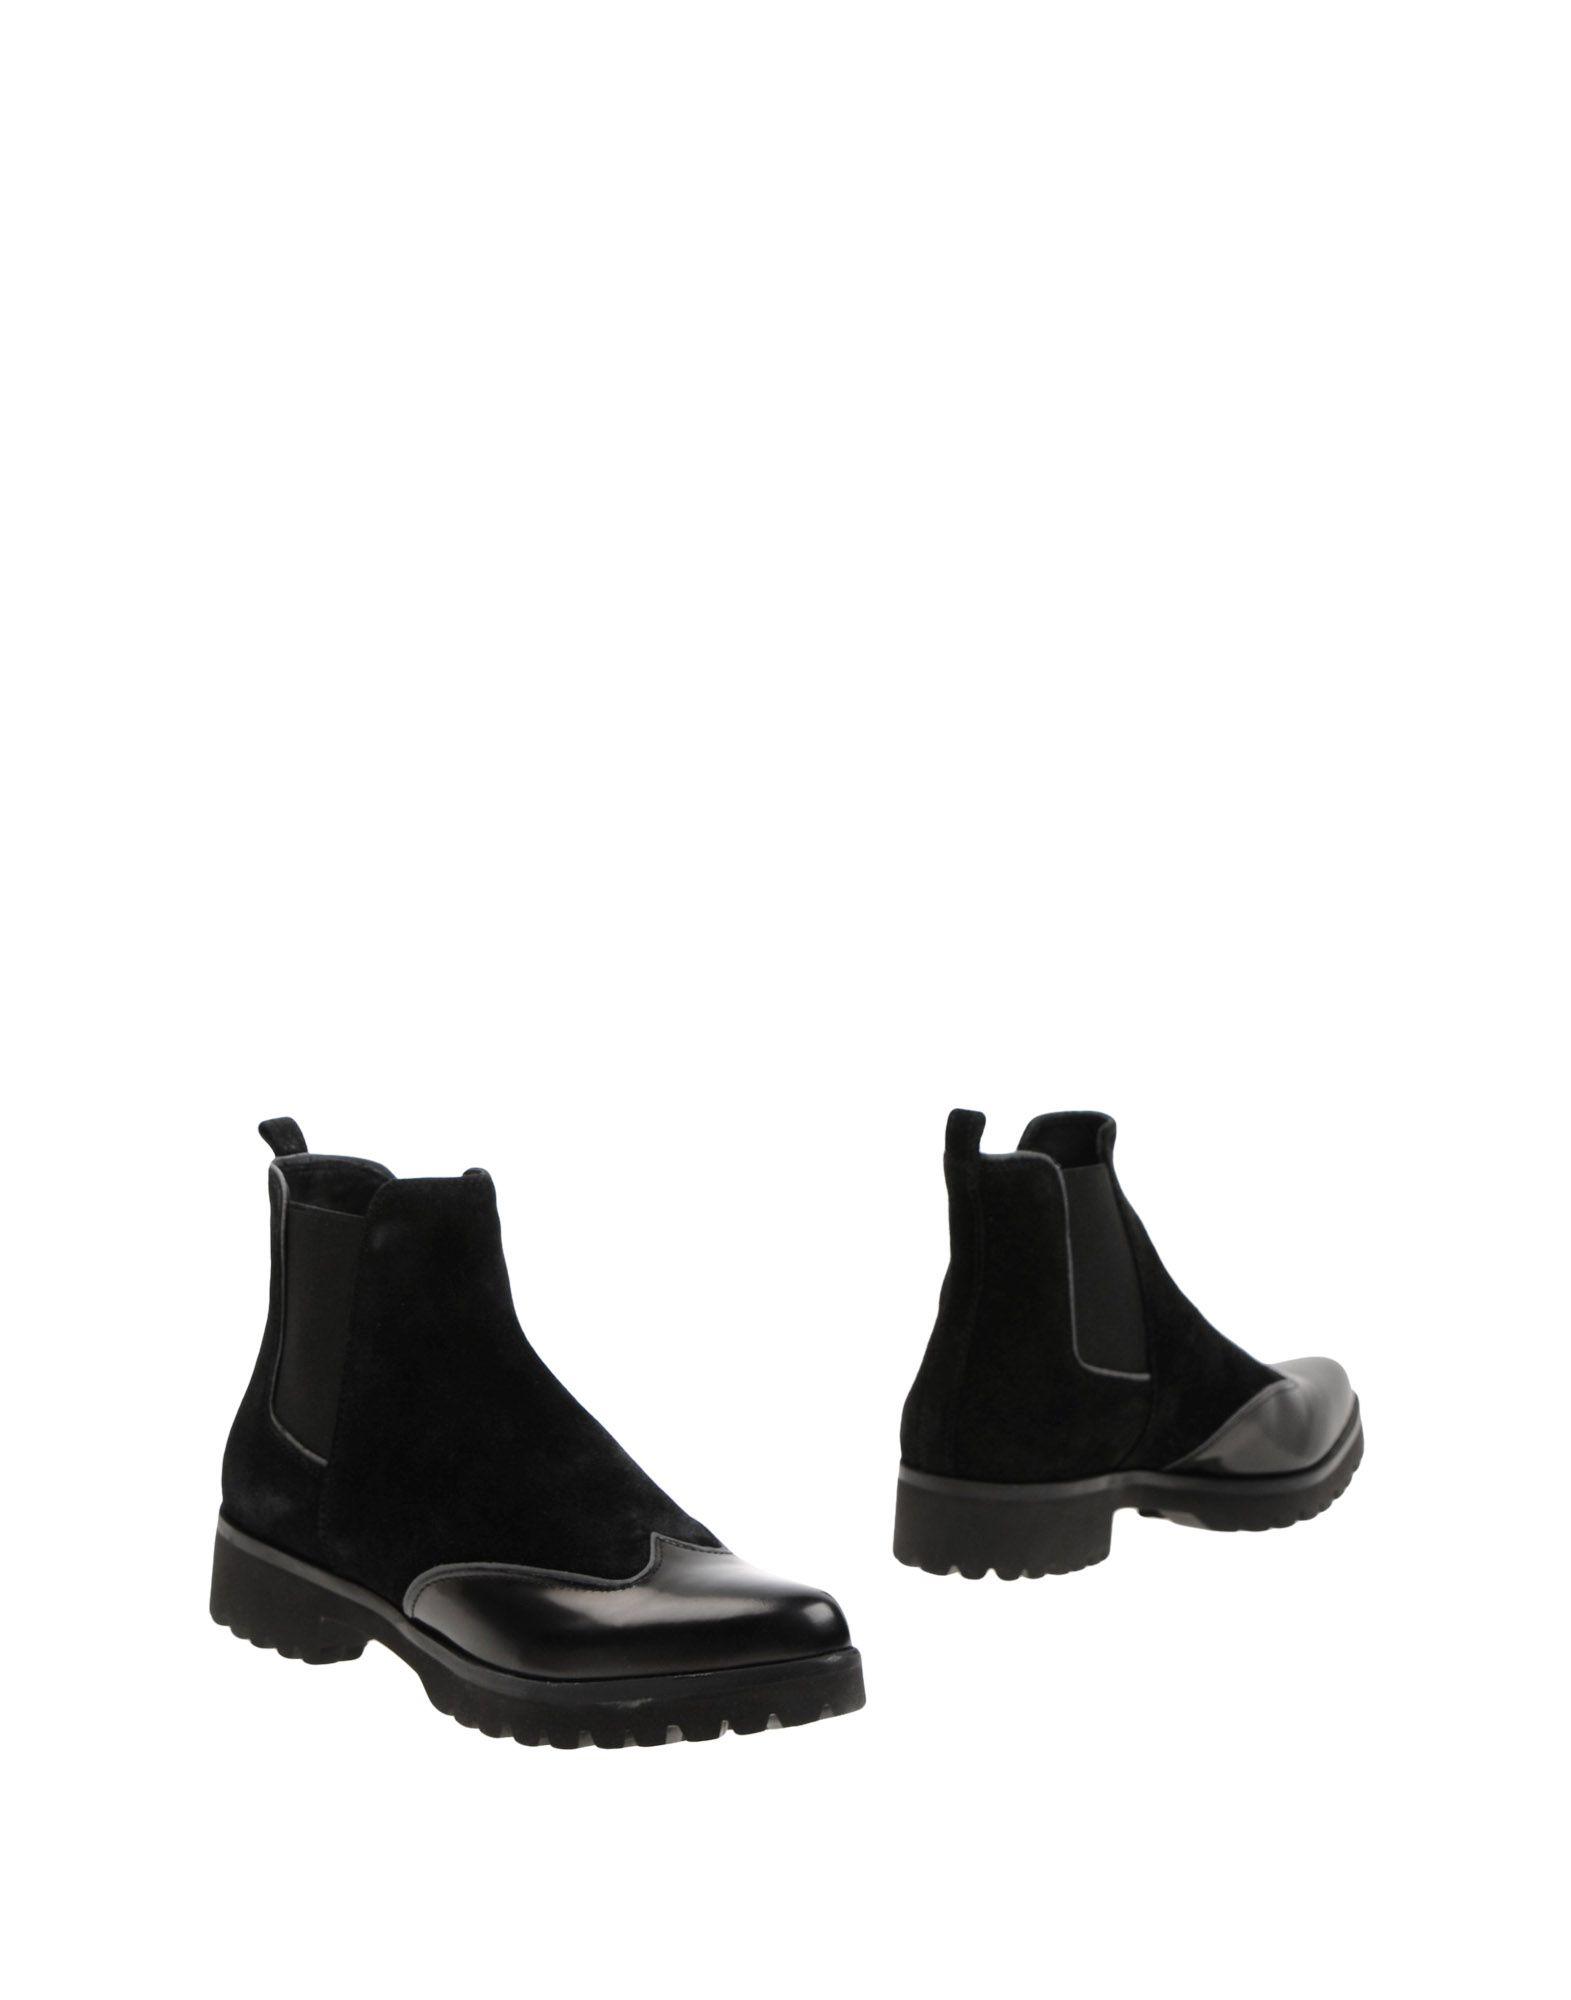 Geox Chelsea Stiefel Damen 11409336JU Gute Qualität beliebte Schuhe